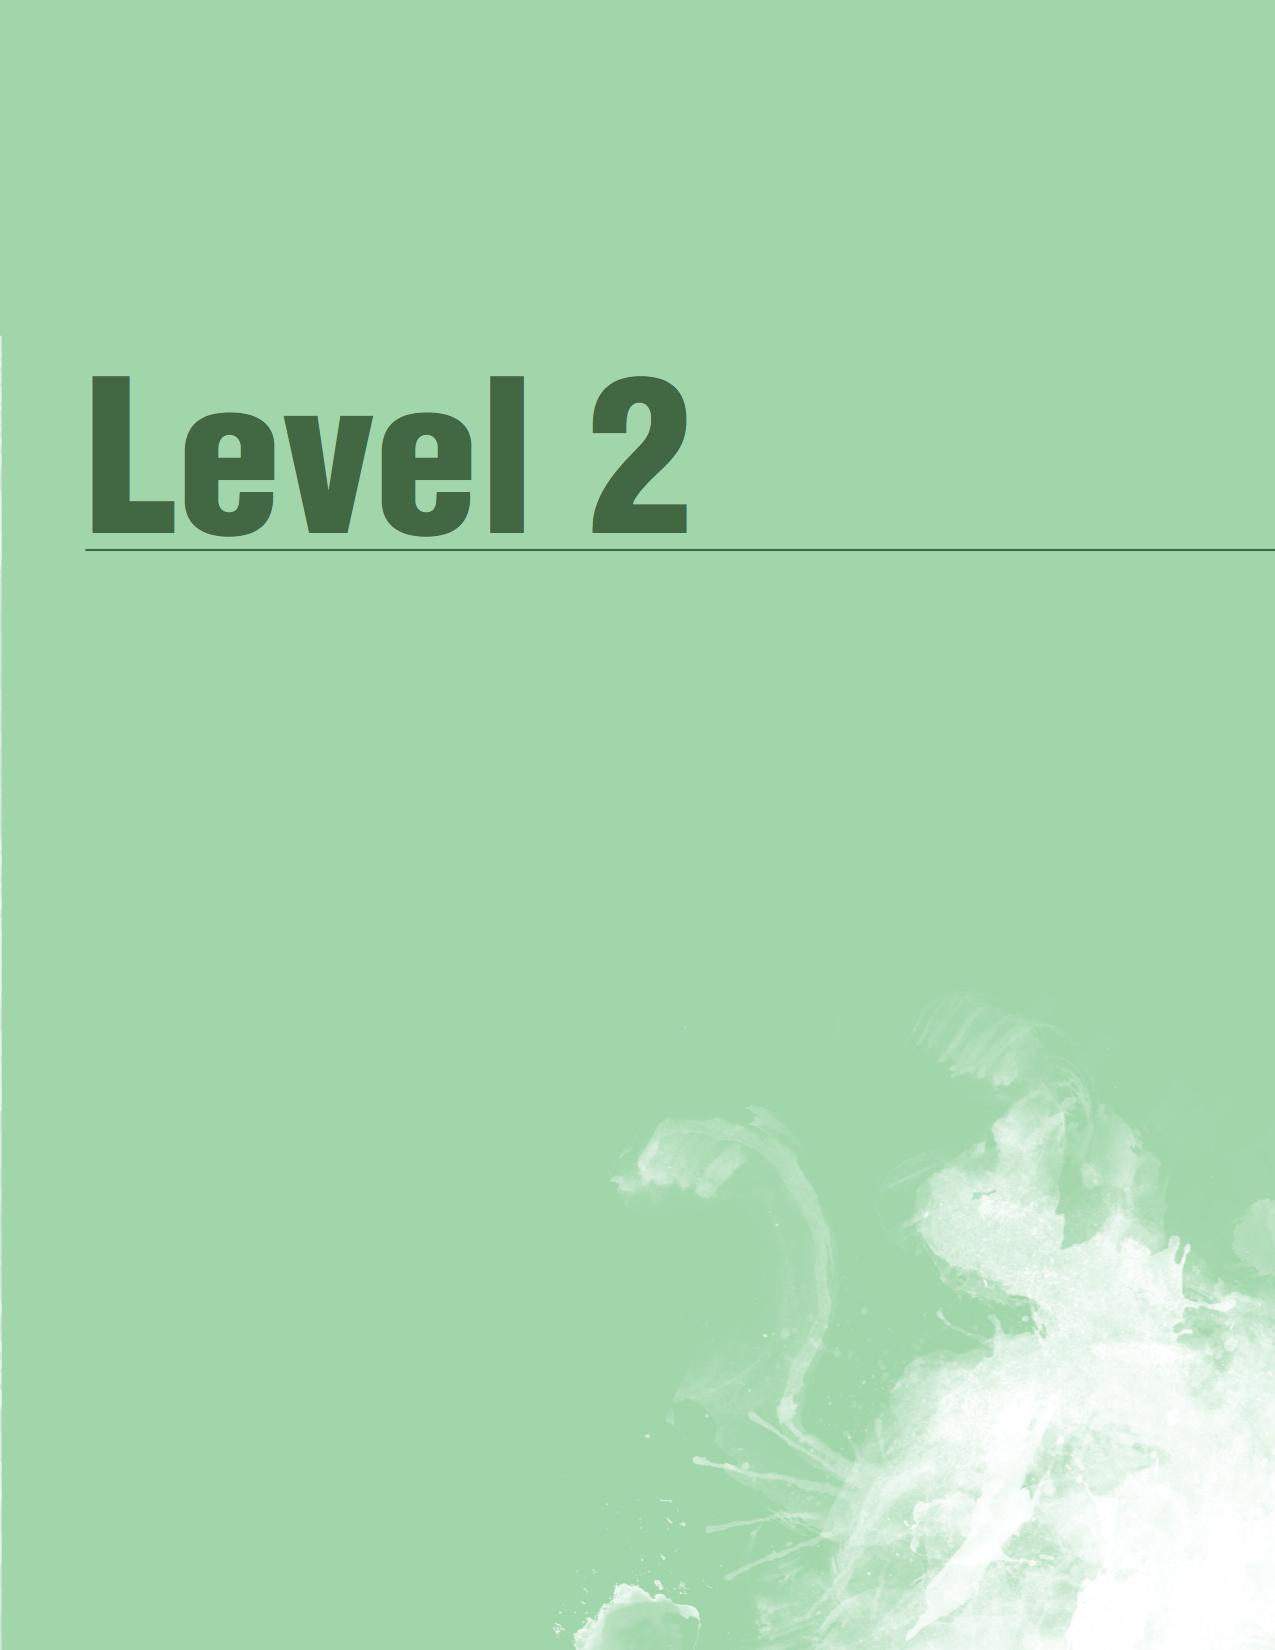 avanttot-print (2) (dragged) 28.jpeg